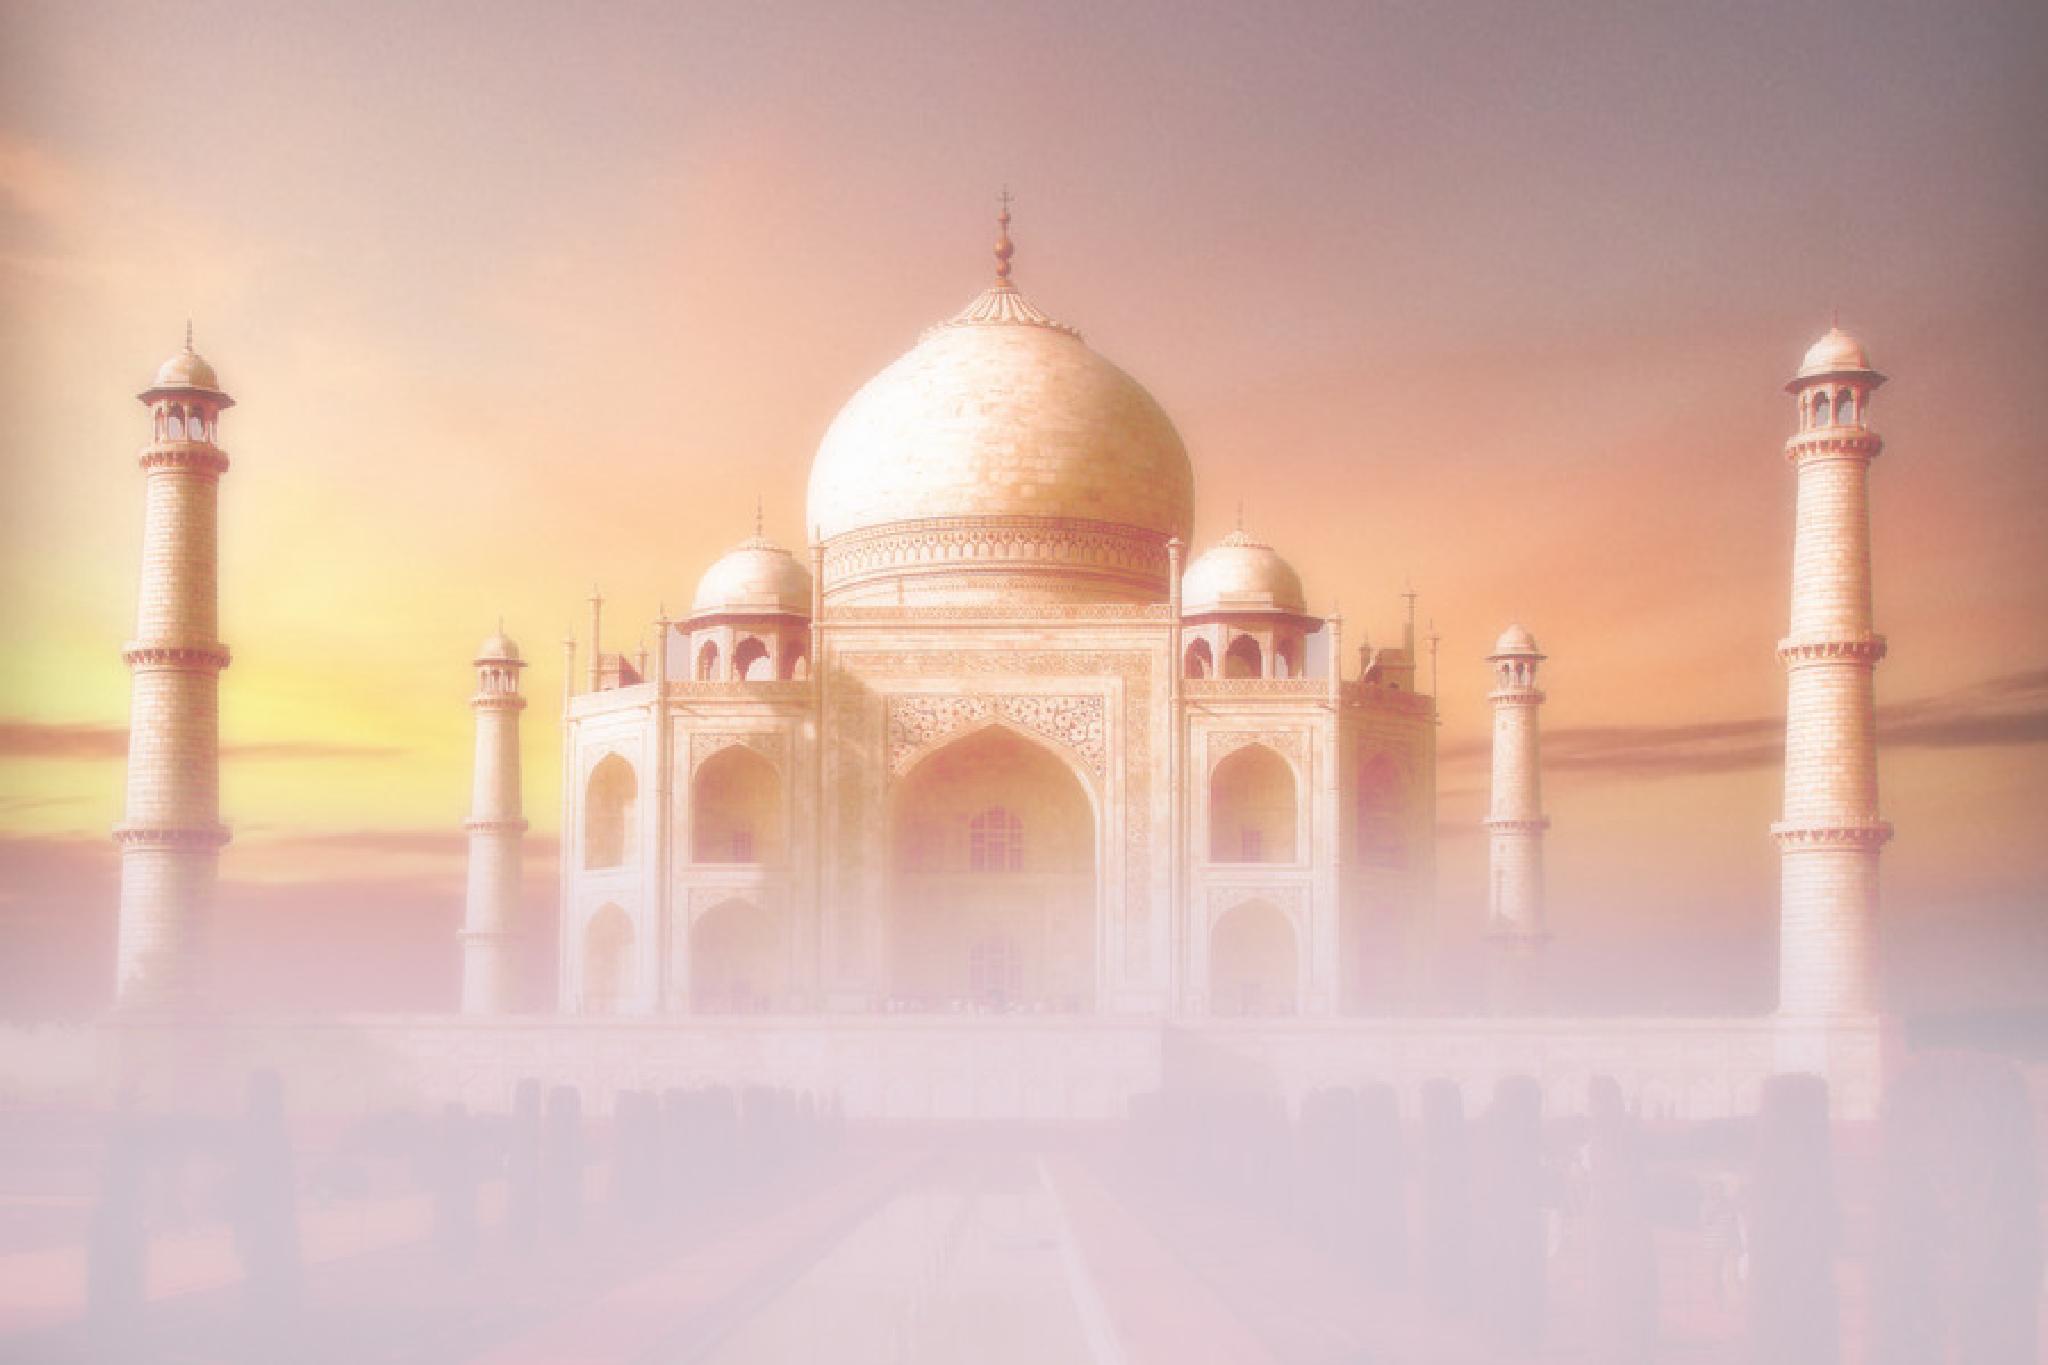 Taj Mahal by toalafoto